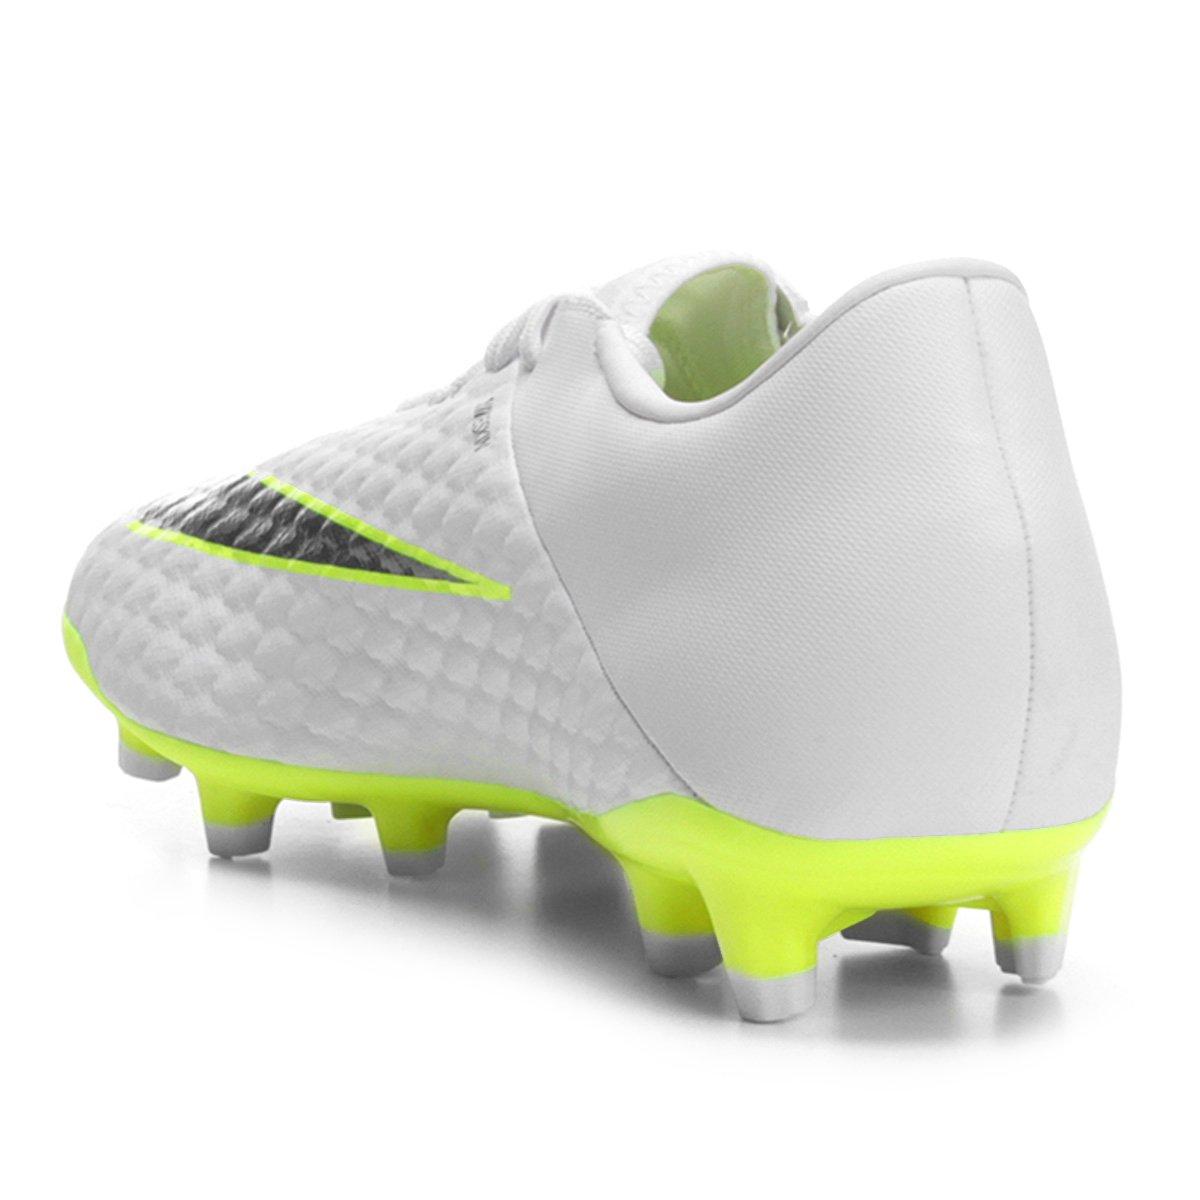 2df837a574 Chuteira Campo Nike Hypervenom Phantom 3 Academy FG - Branco e Cinza ...